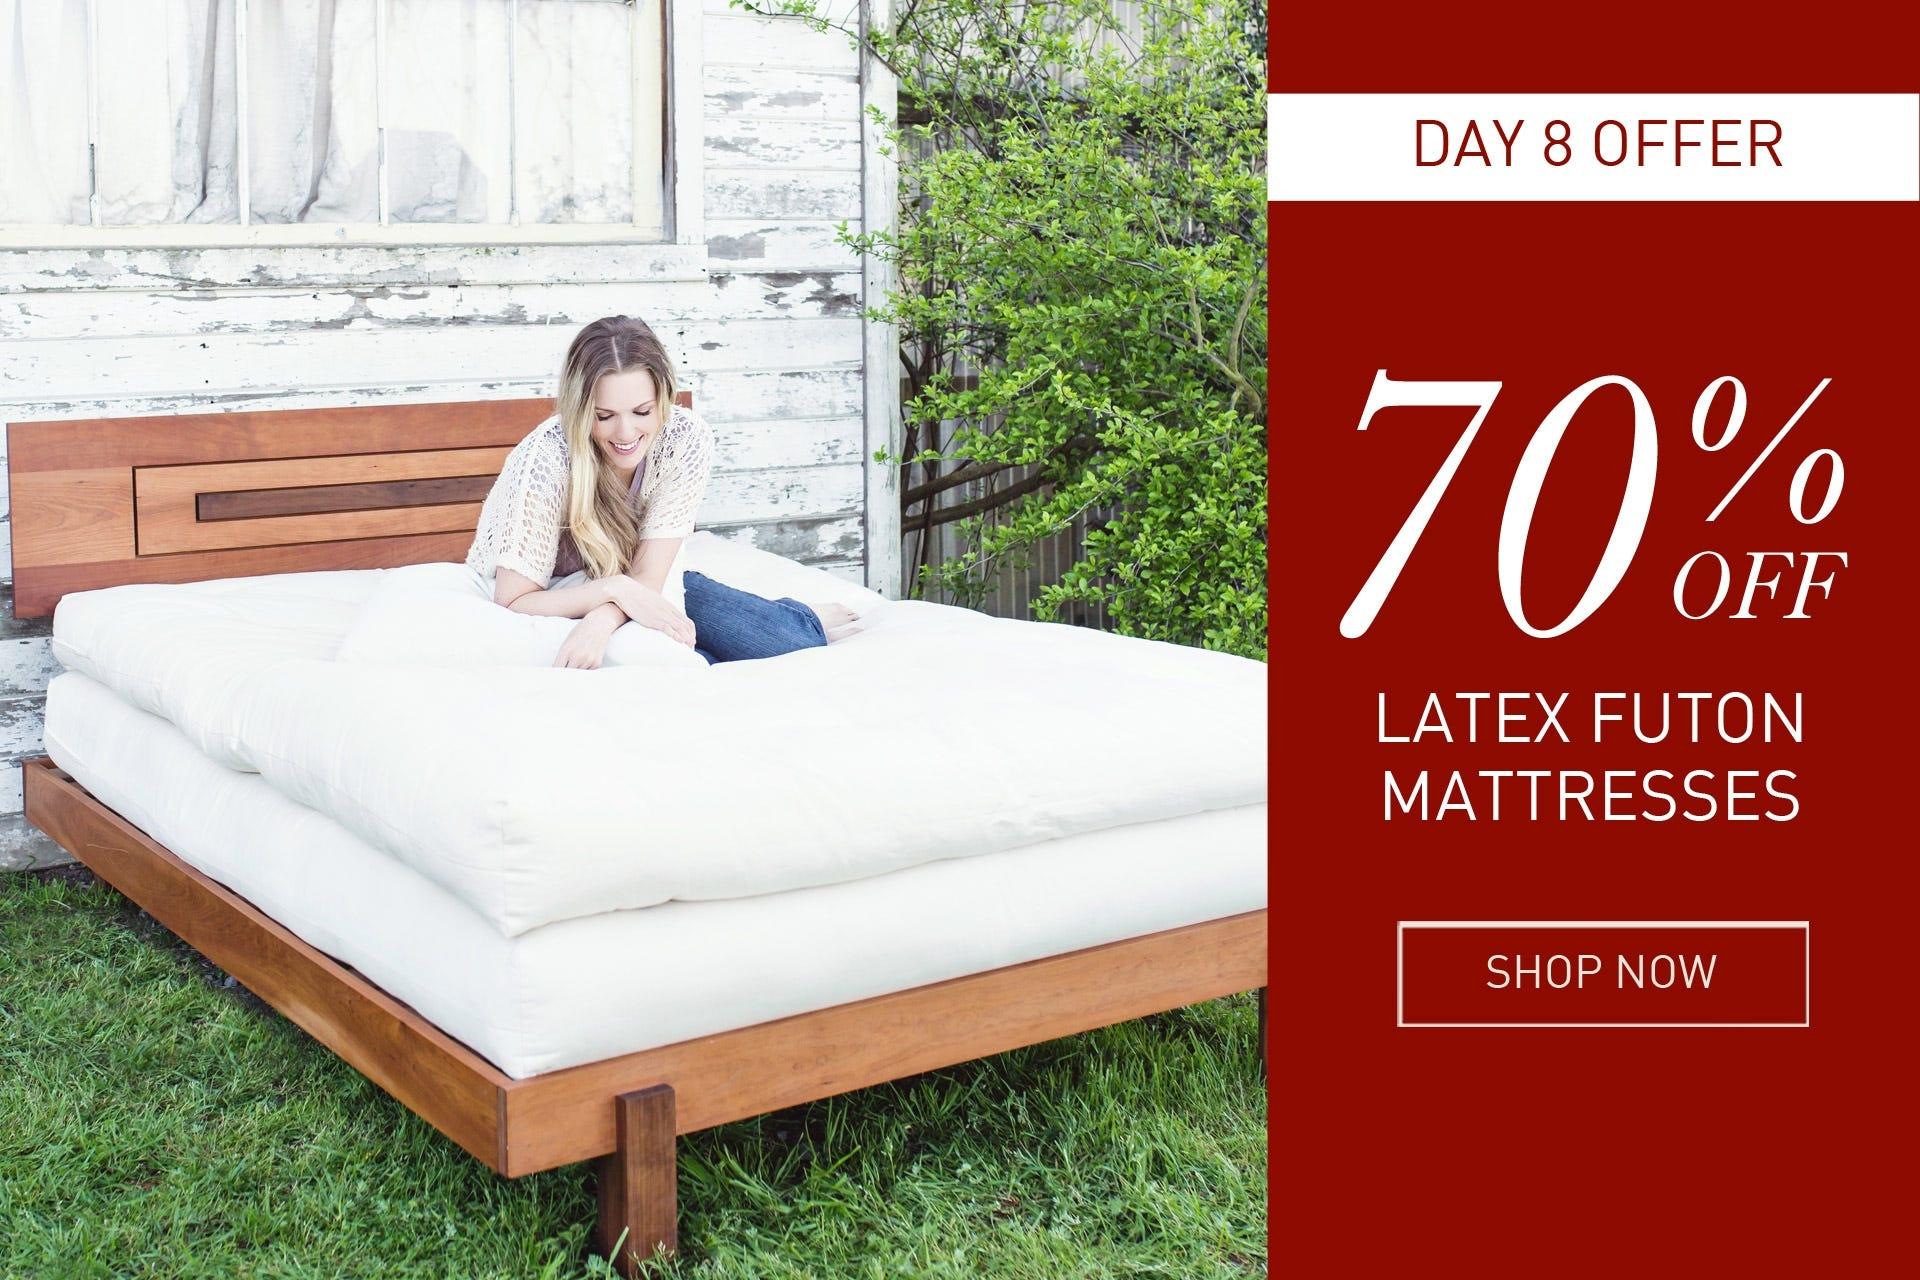 latex futon mattresses